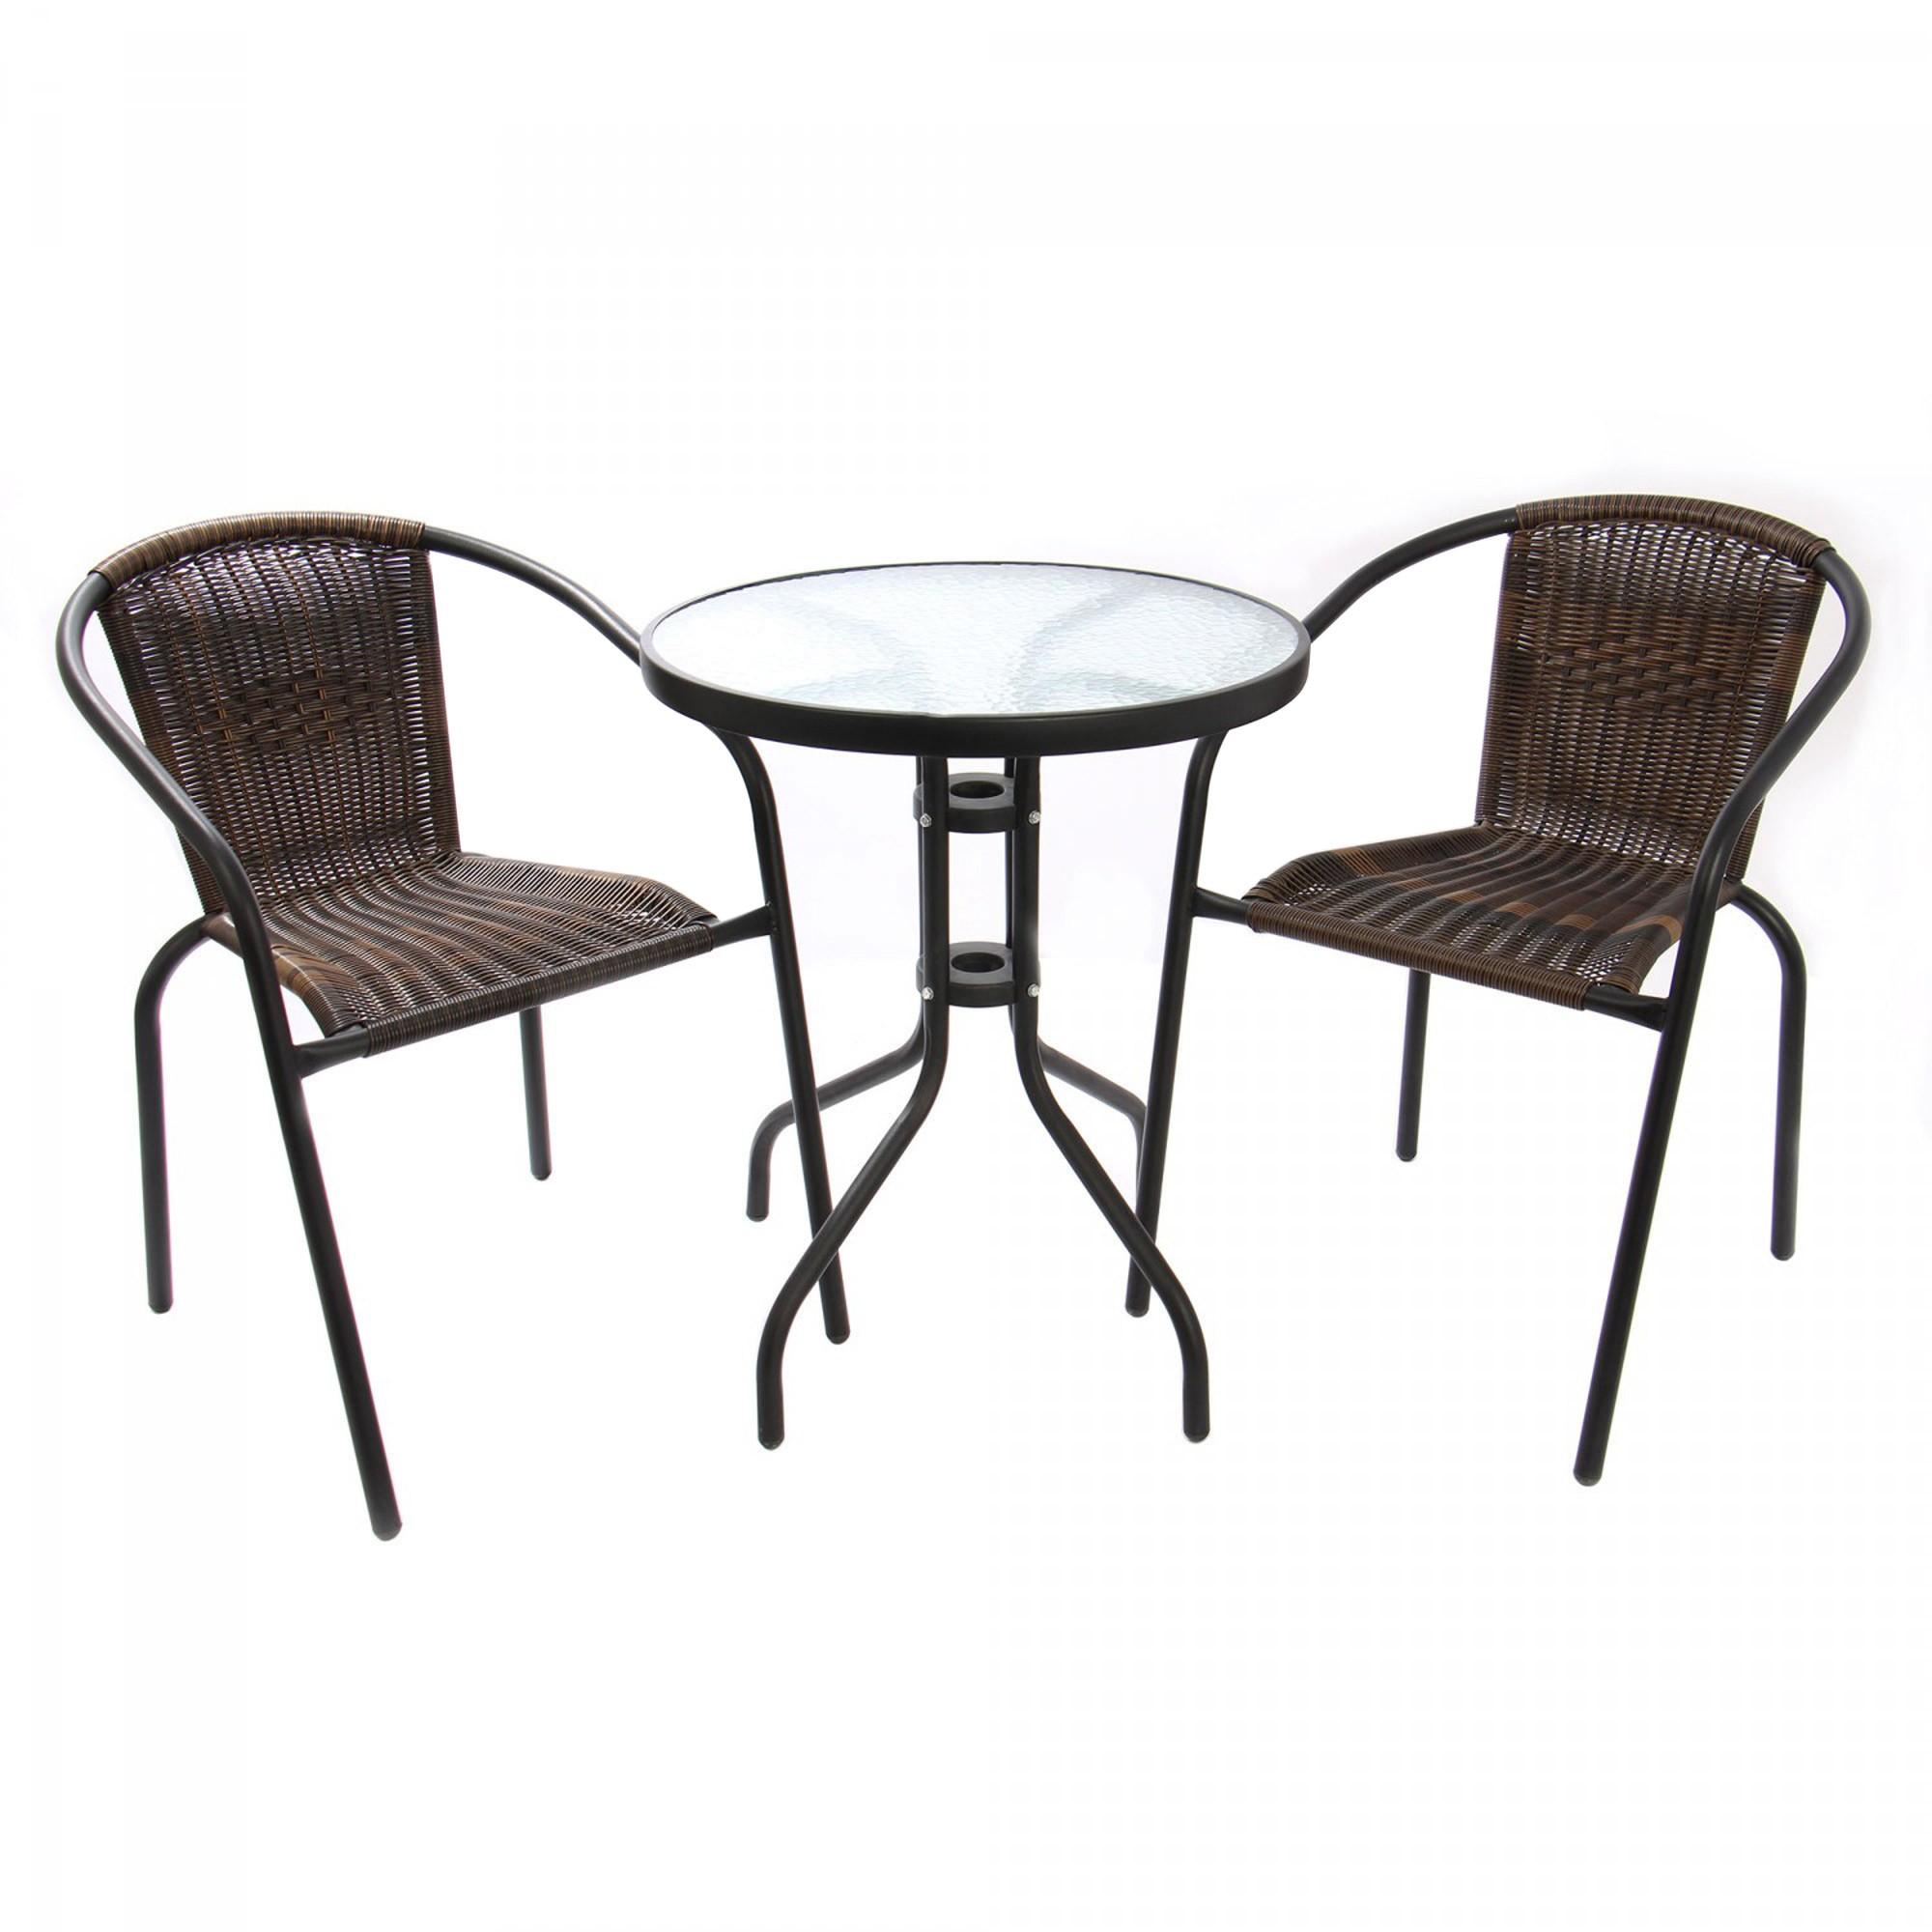 Dedeman set bistro masa cu 2 scaune din ratan sintetic for Masa cu scaune dedeman